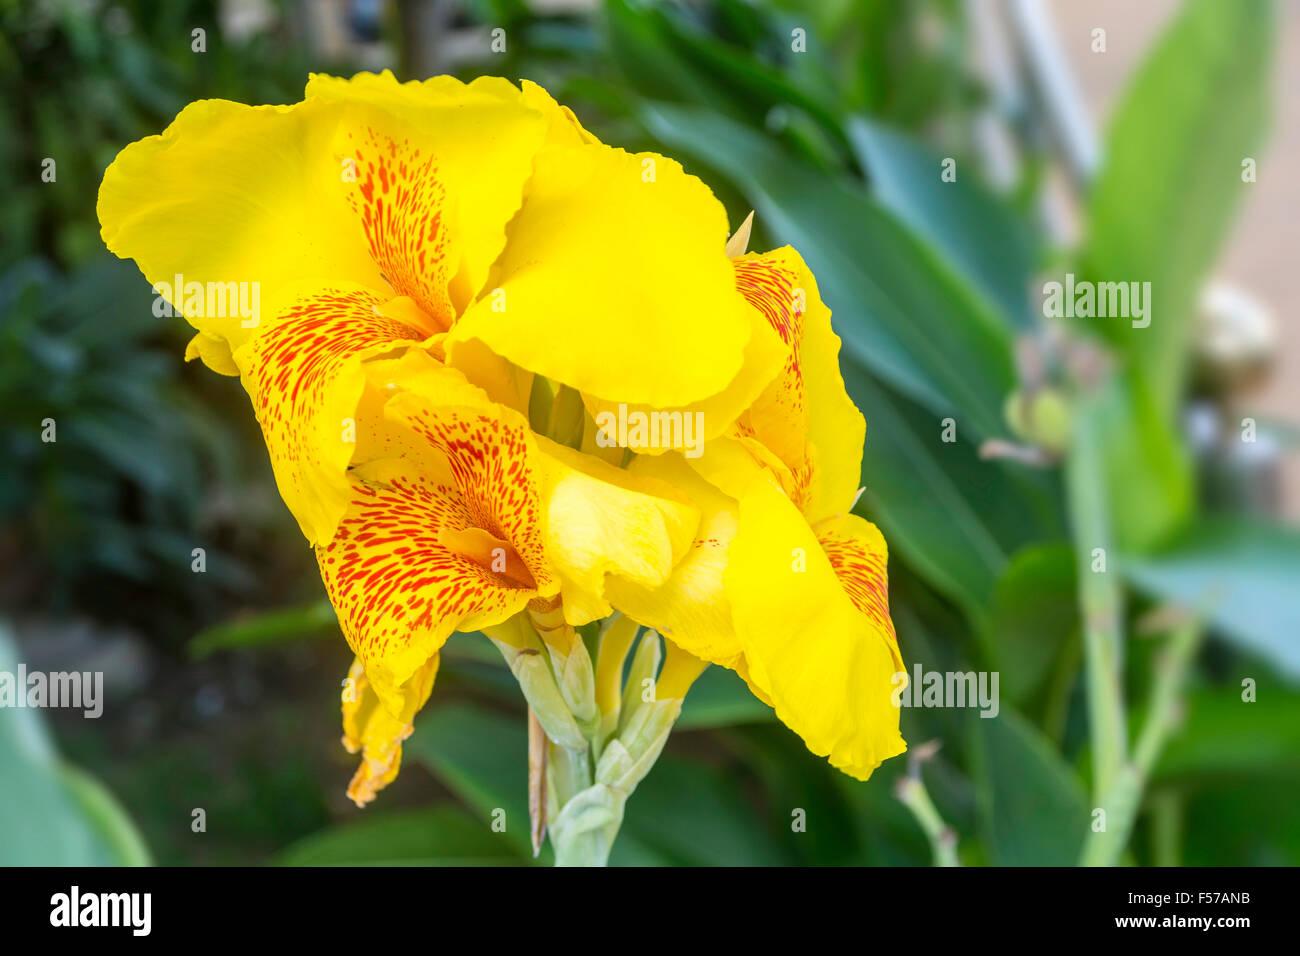 Canna Flower Stock Photos Canna Flower Stock Images Alamy